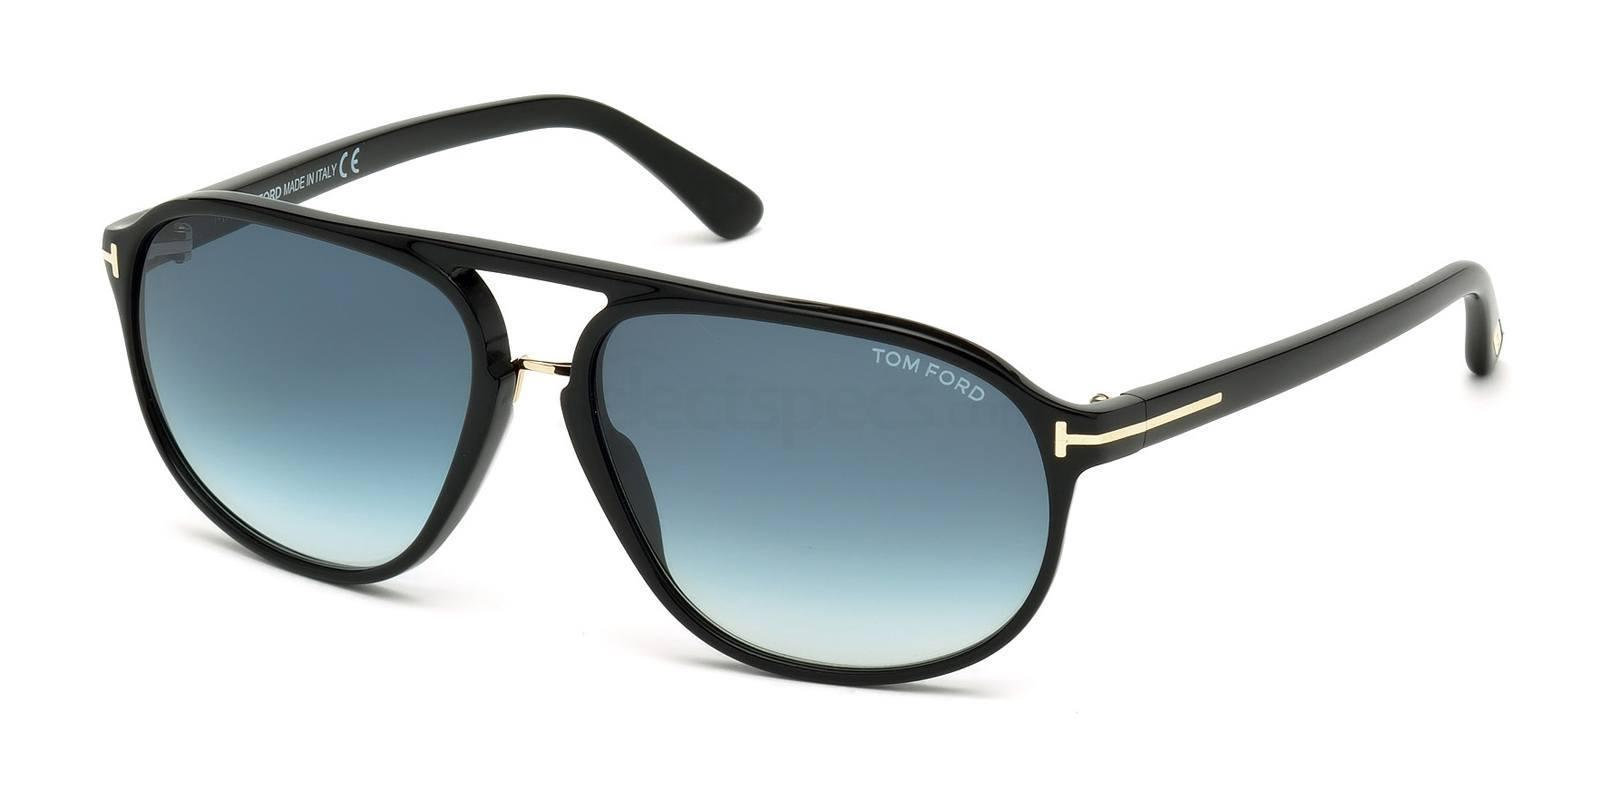 01P FT0447 Sunglasses, Tom Ford